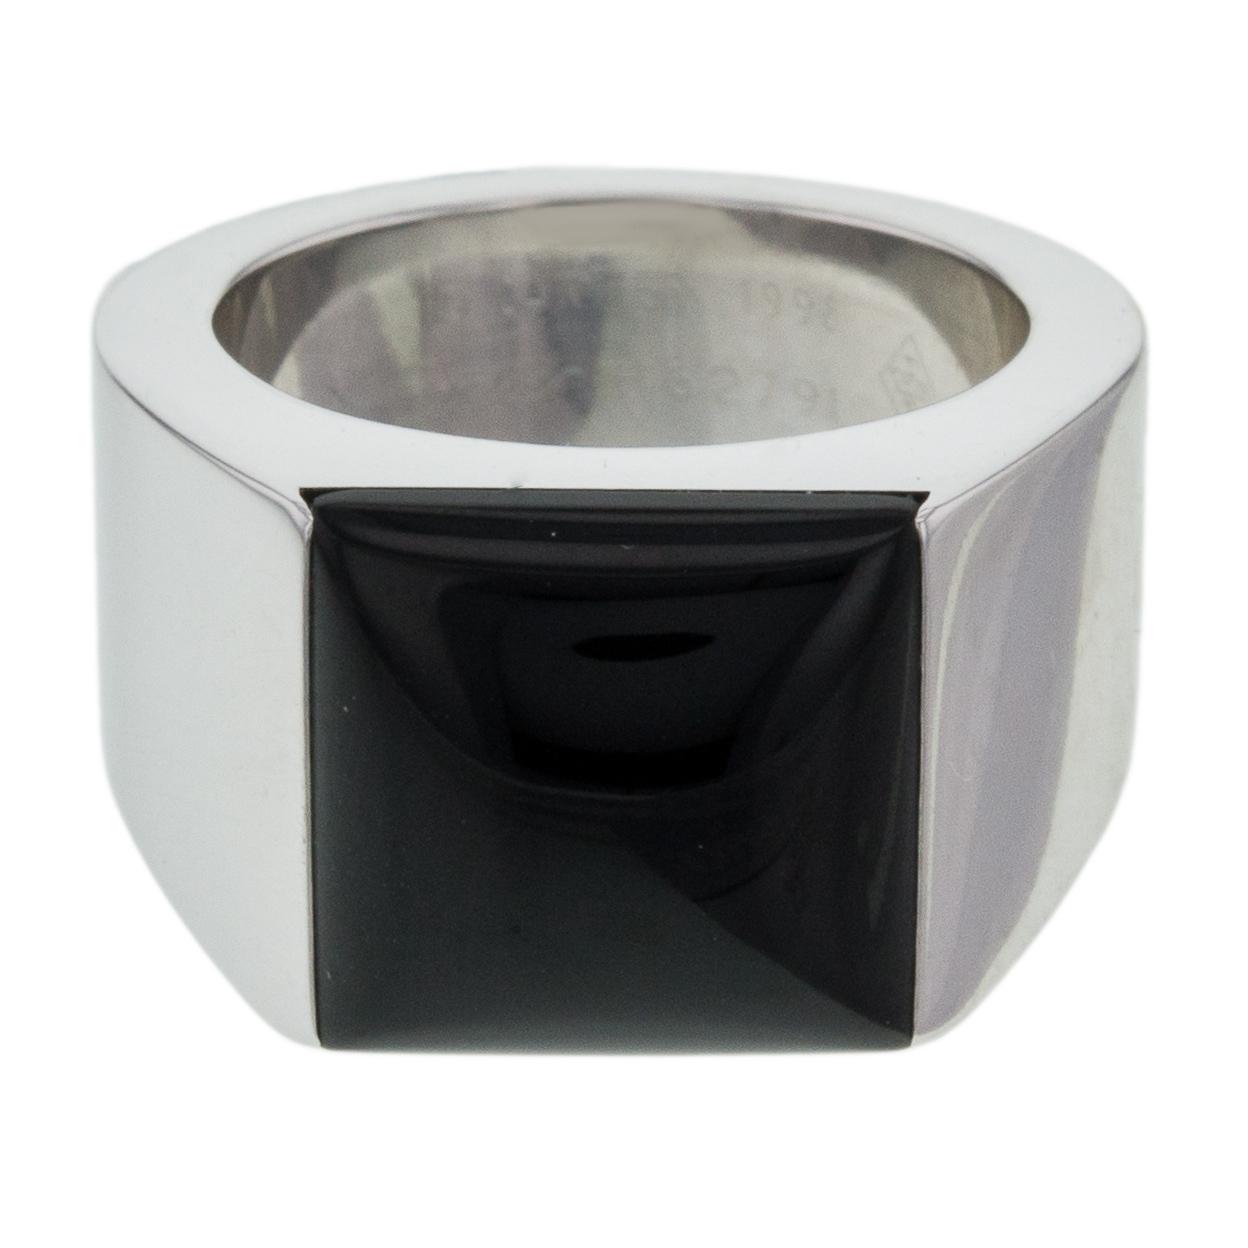 c3c3ced6df3d2 Cartier Tank Ring 18K White Gold Black Onyx Size 5.25